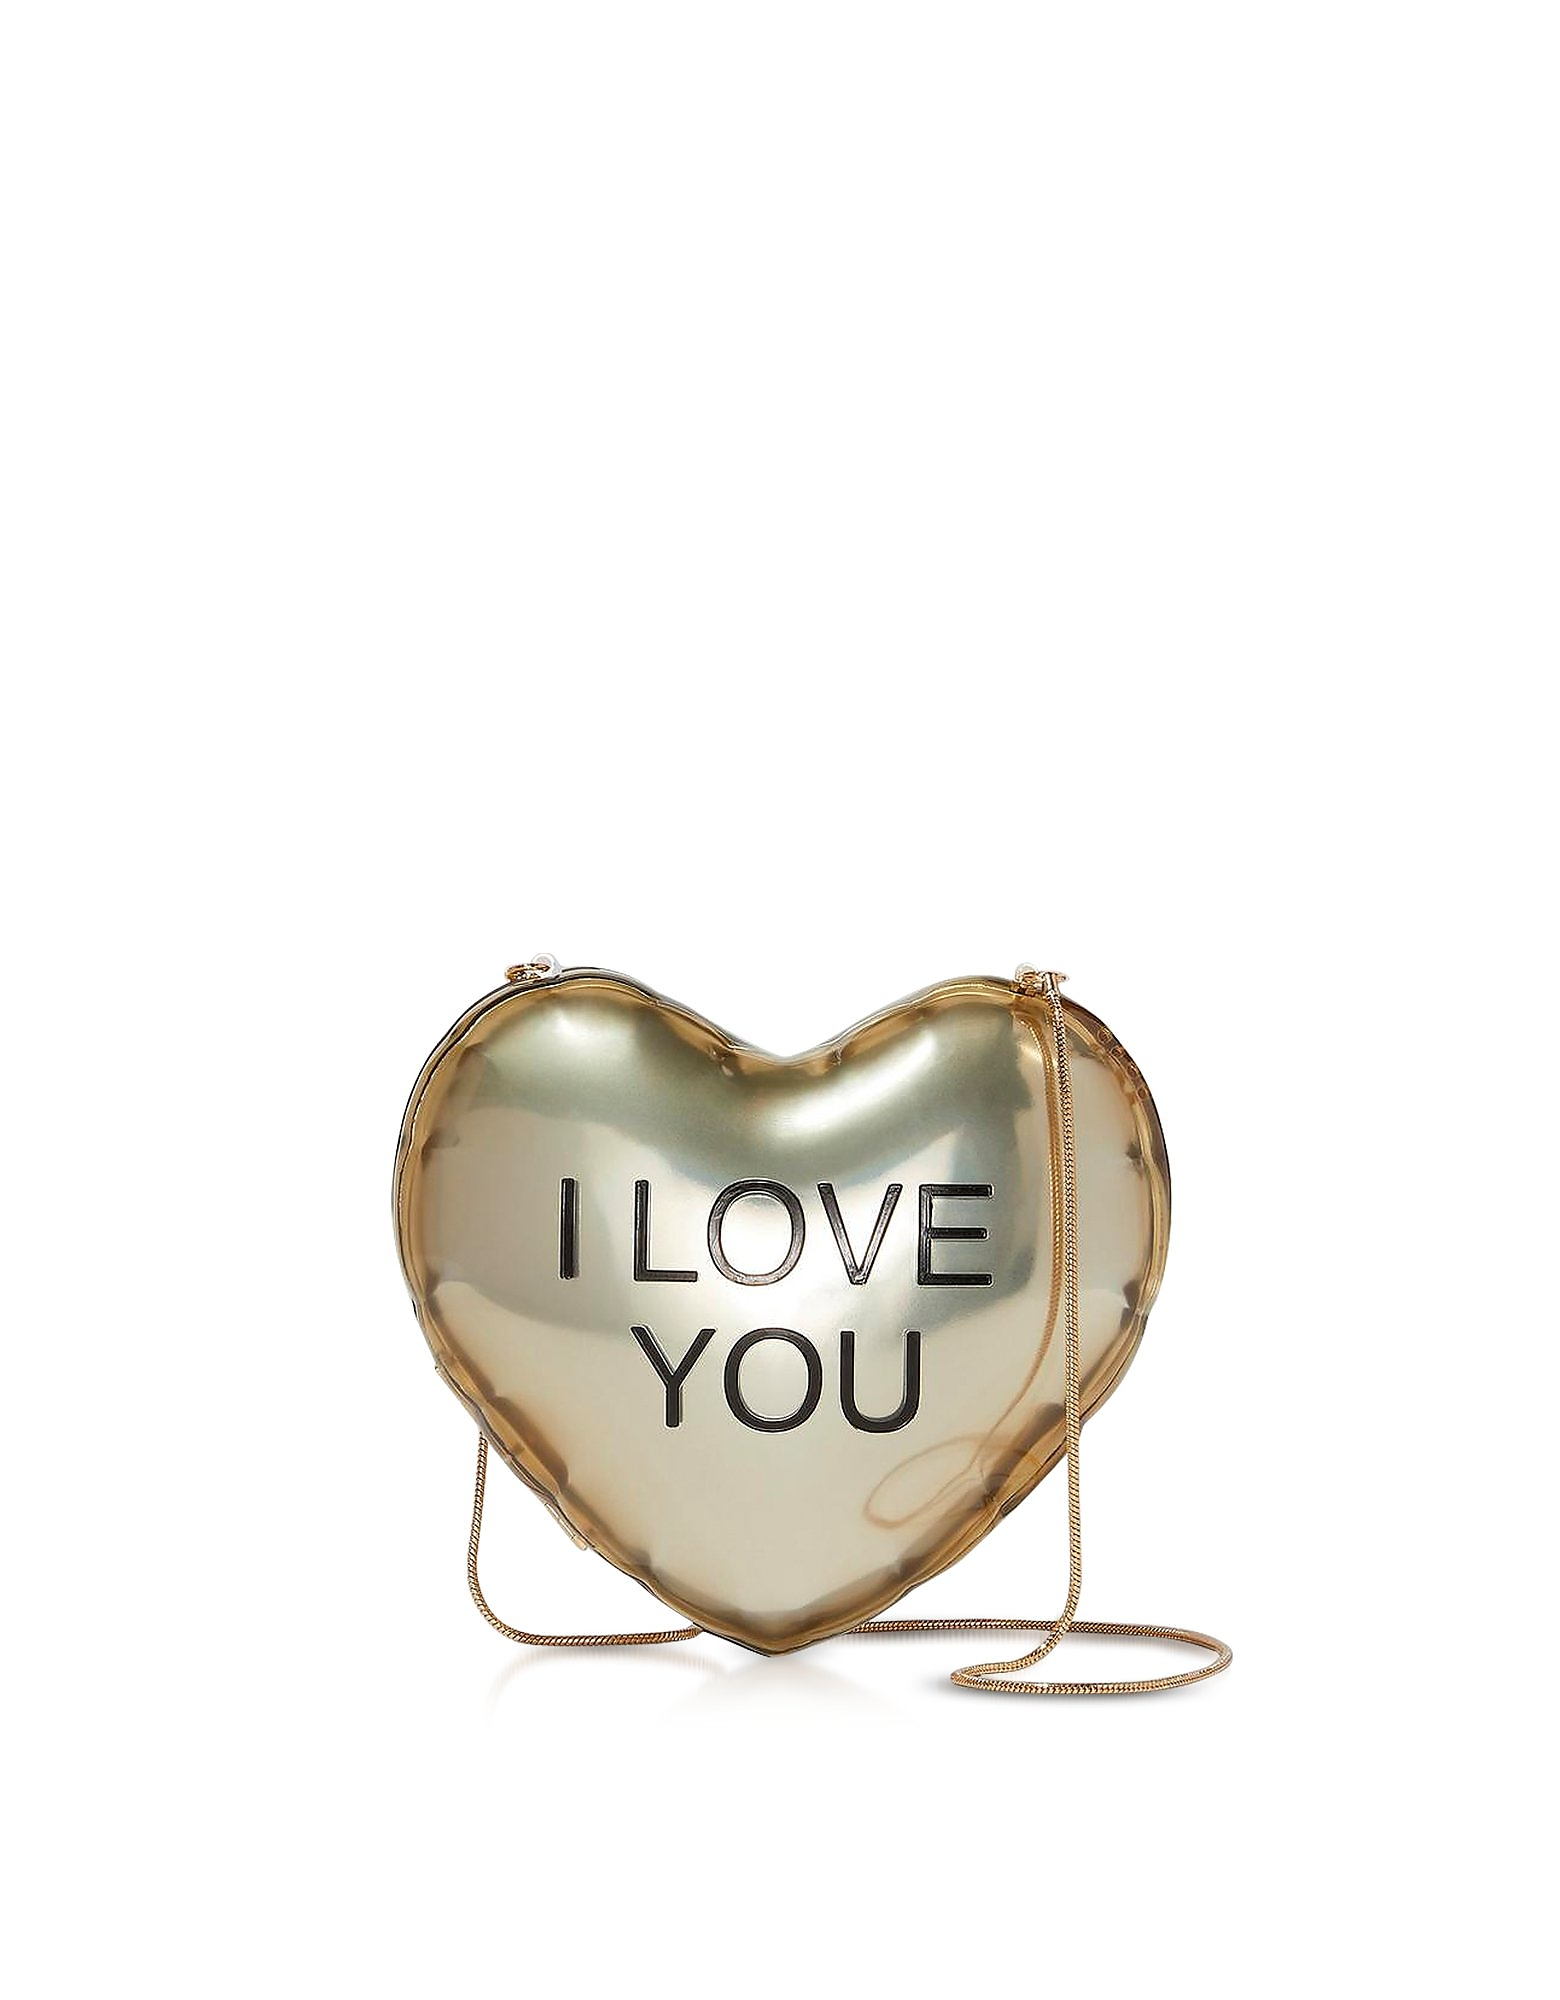 Marc Jacobs Designer Handbags, The Balloon Minaudiere Gold Plastic Heart Clutch